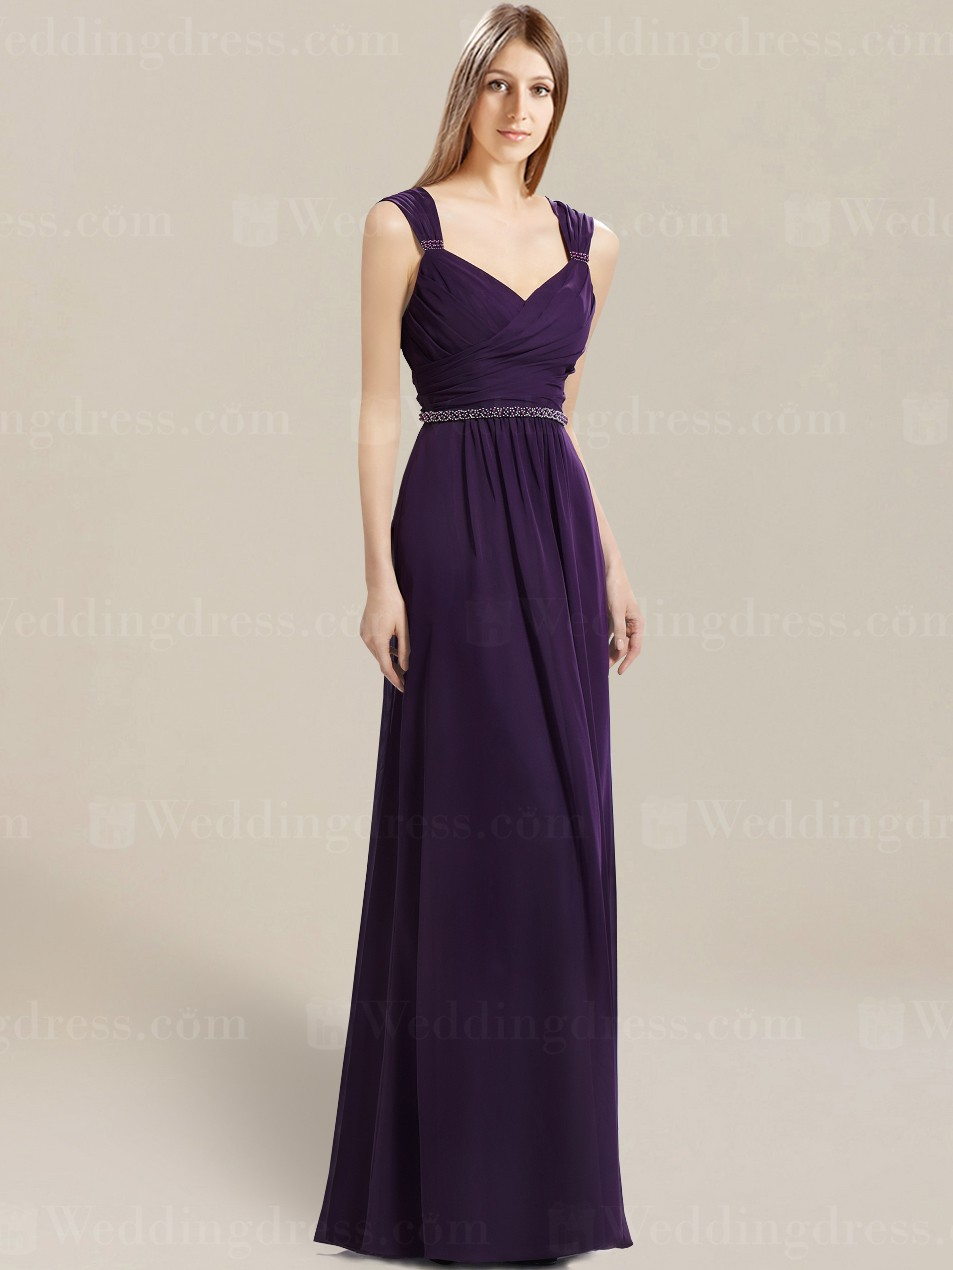 d4dfb2df8e Modest Purple Bridesmaid Dresses - Gomes Weine AG